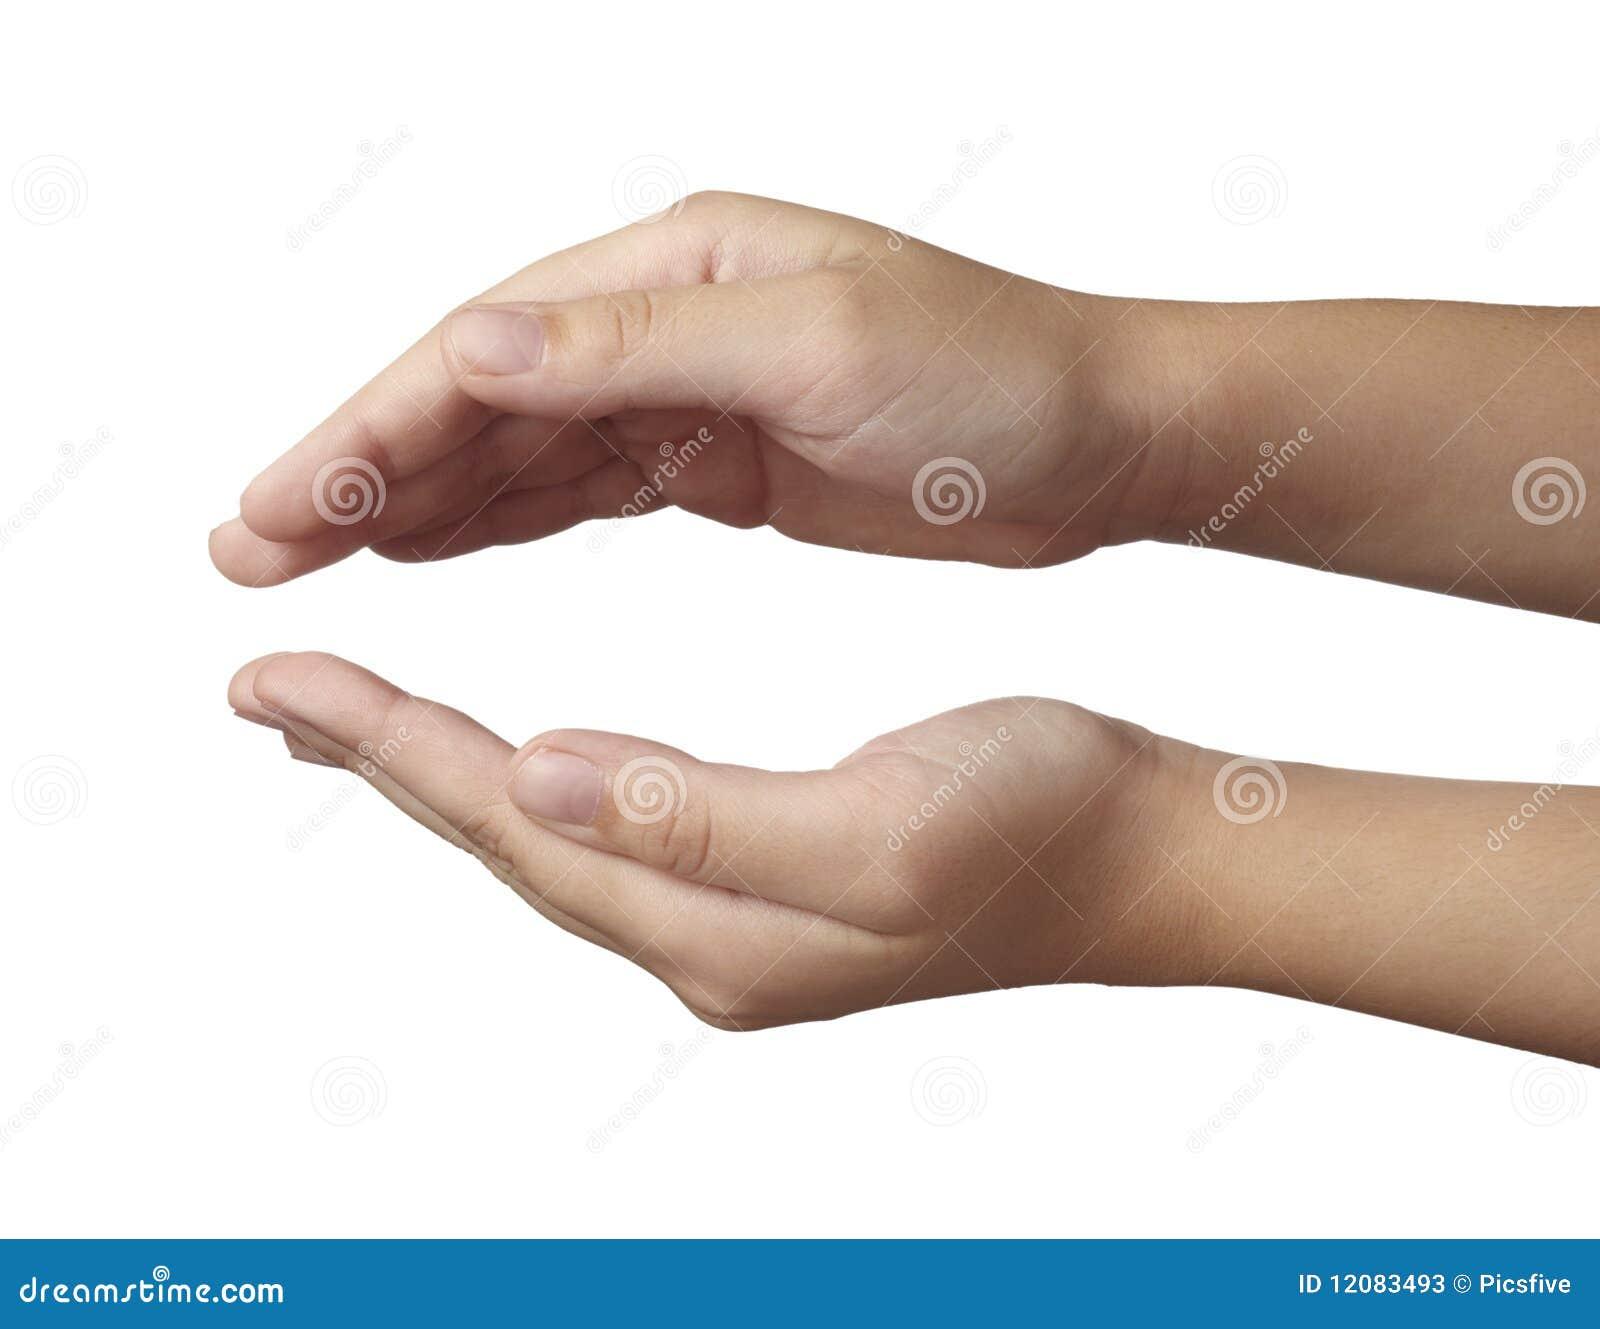 Hand Gesture Body Language Stock Photos - Image: 12083493